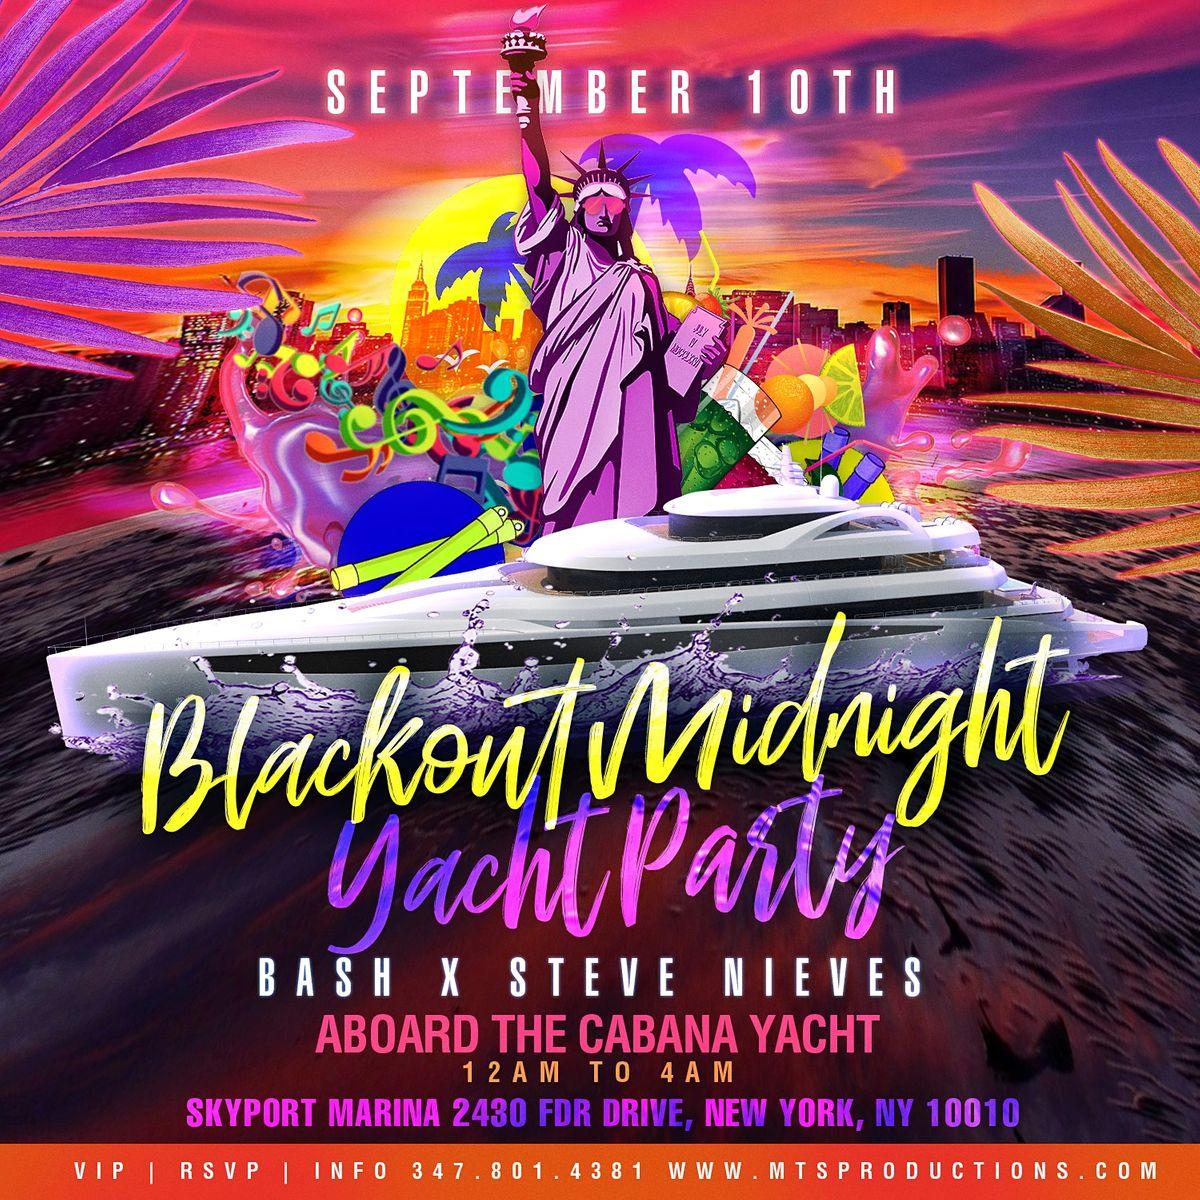 Blackout Midnight Yacht Party at Cabana Yacht